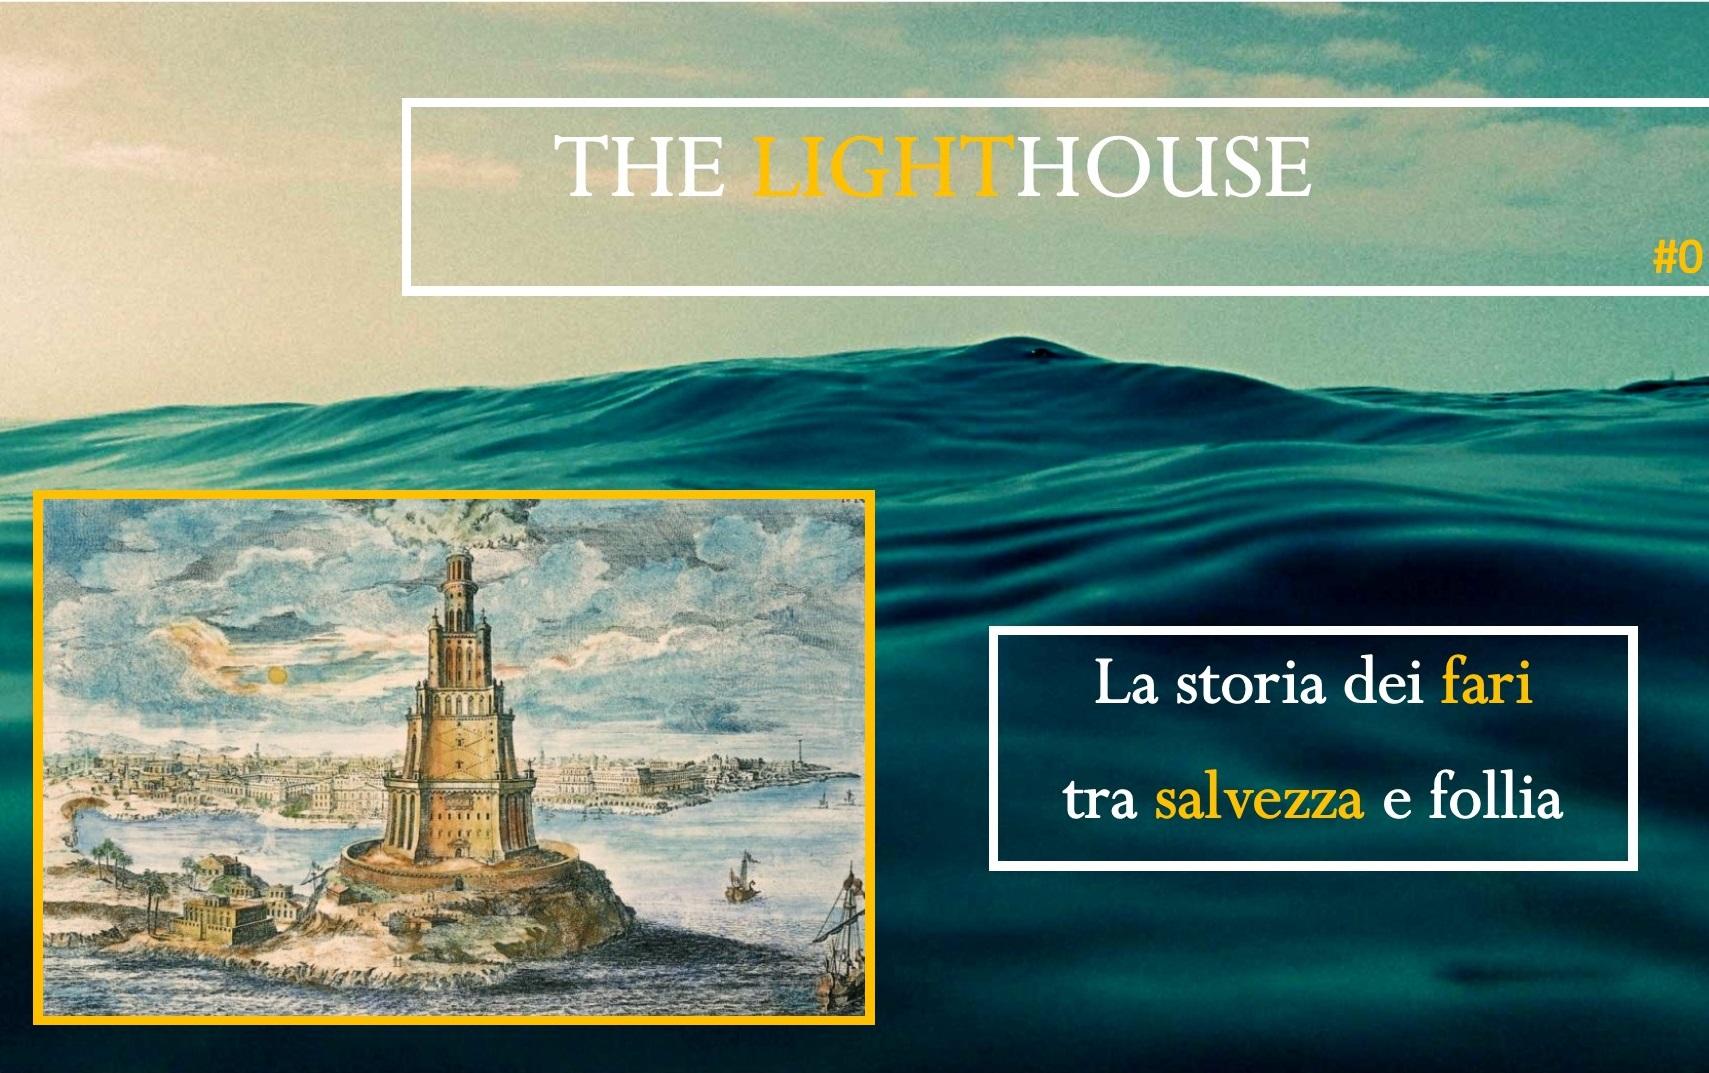 The Lighthouse #0: la storia dei fari, tra salvezza e follia